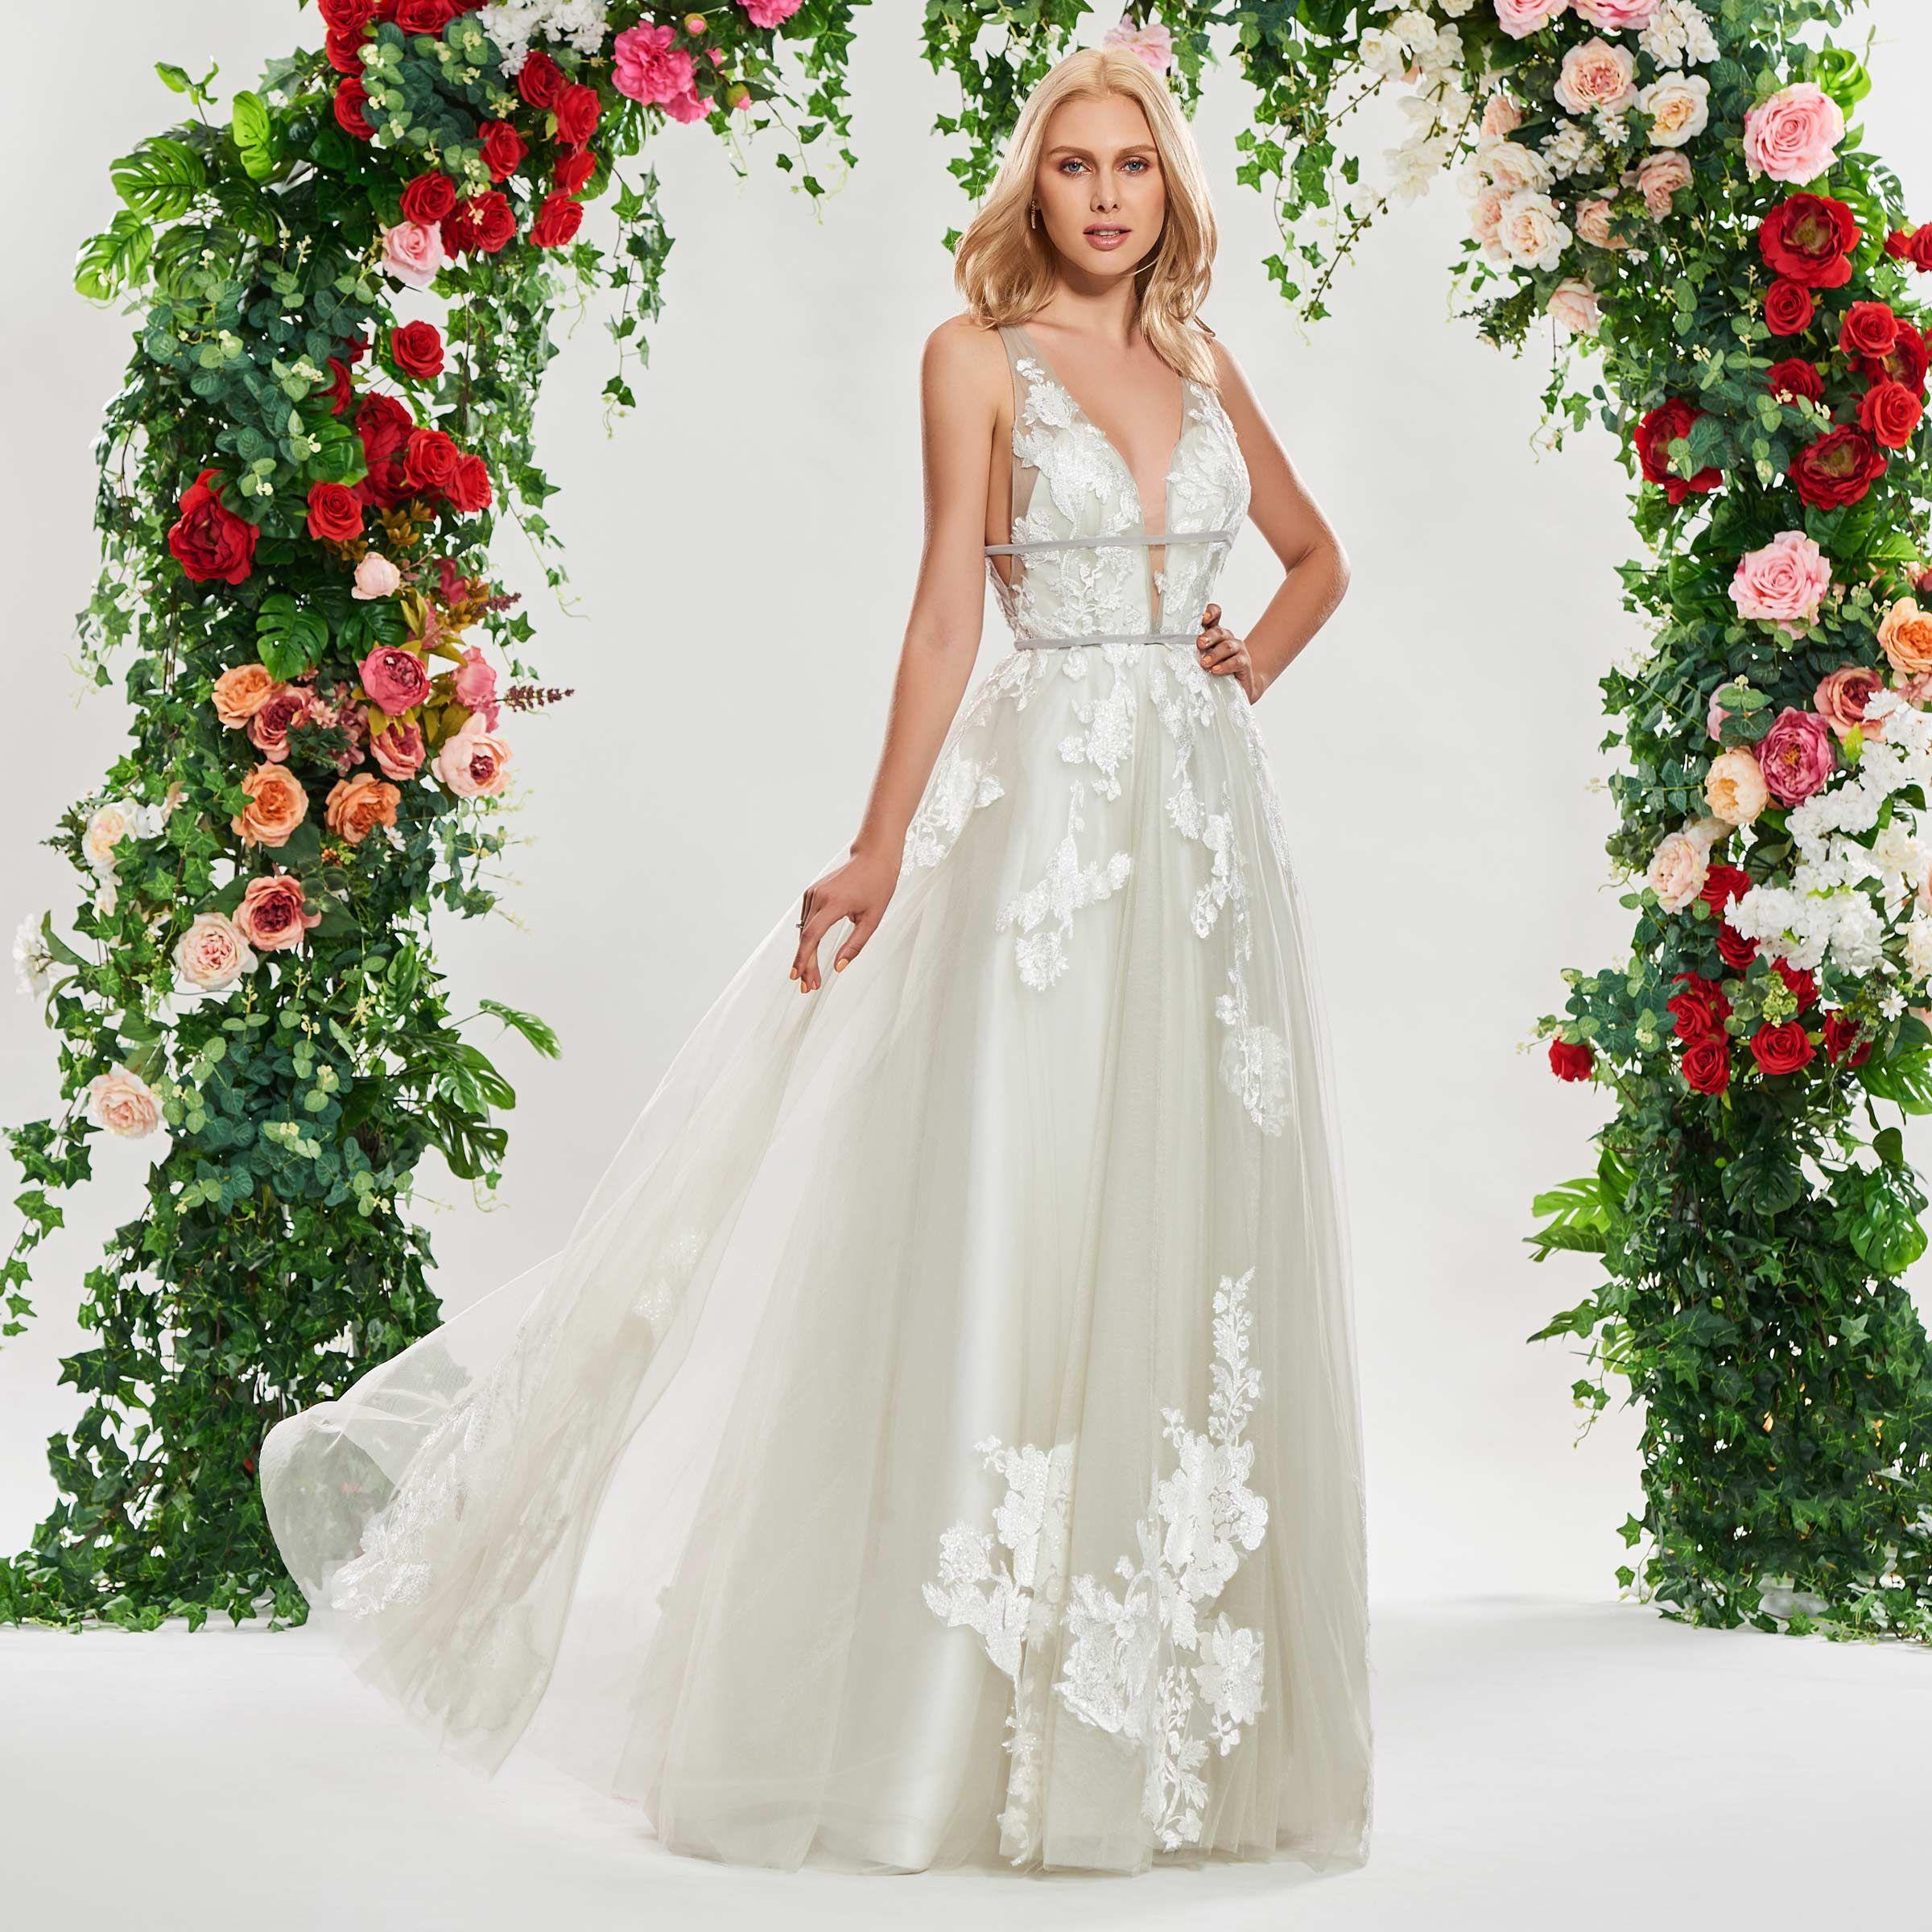 A Line V Neck Backless Beach Wedding Dress Beach Wedding Dresses Backless Applique Wedding Dress Beach Wedding Dress